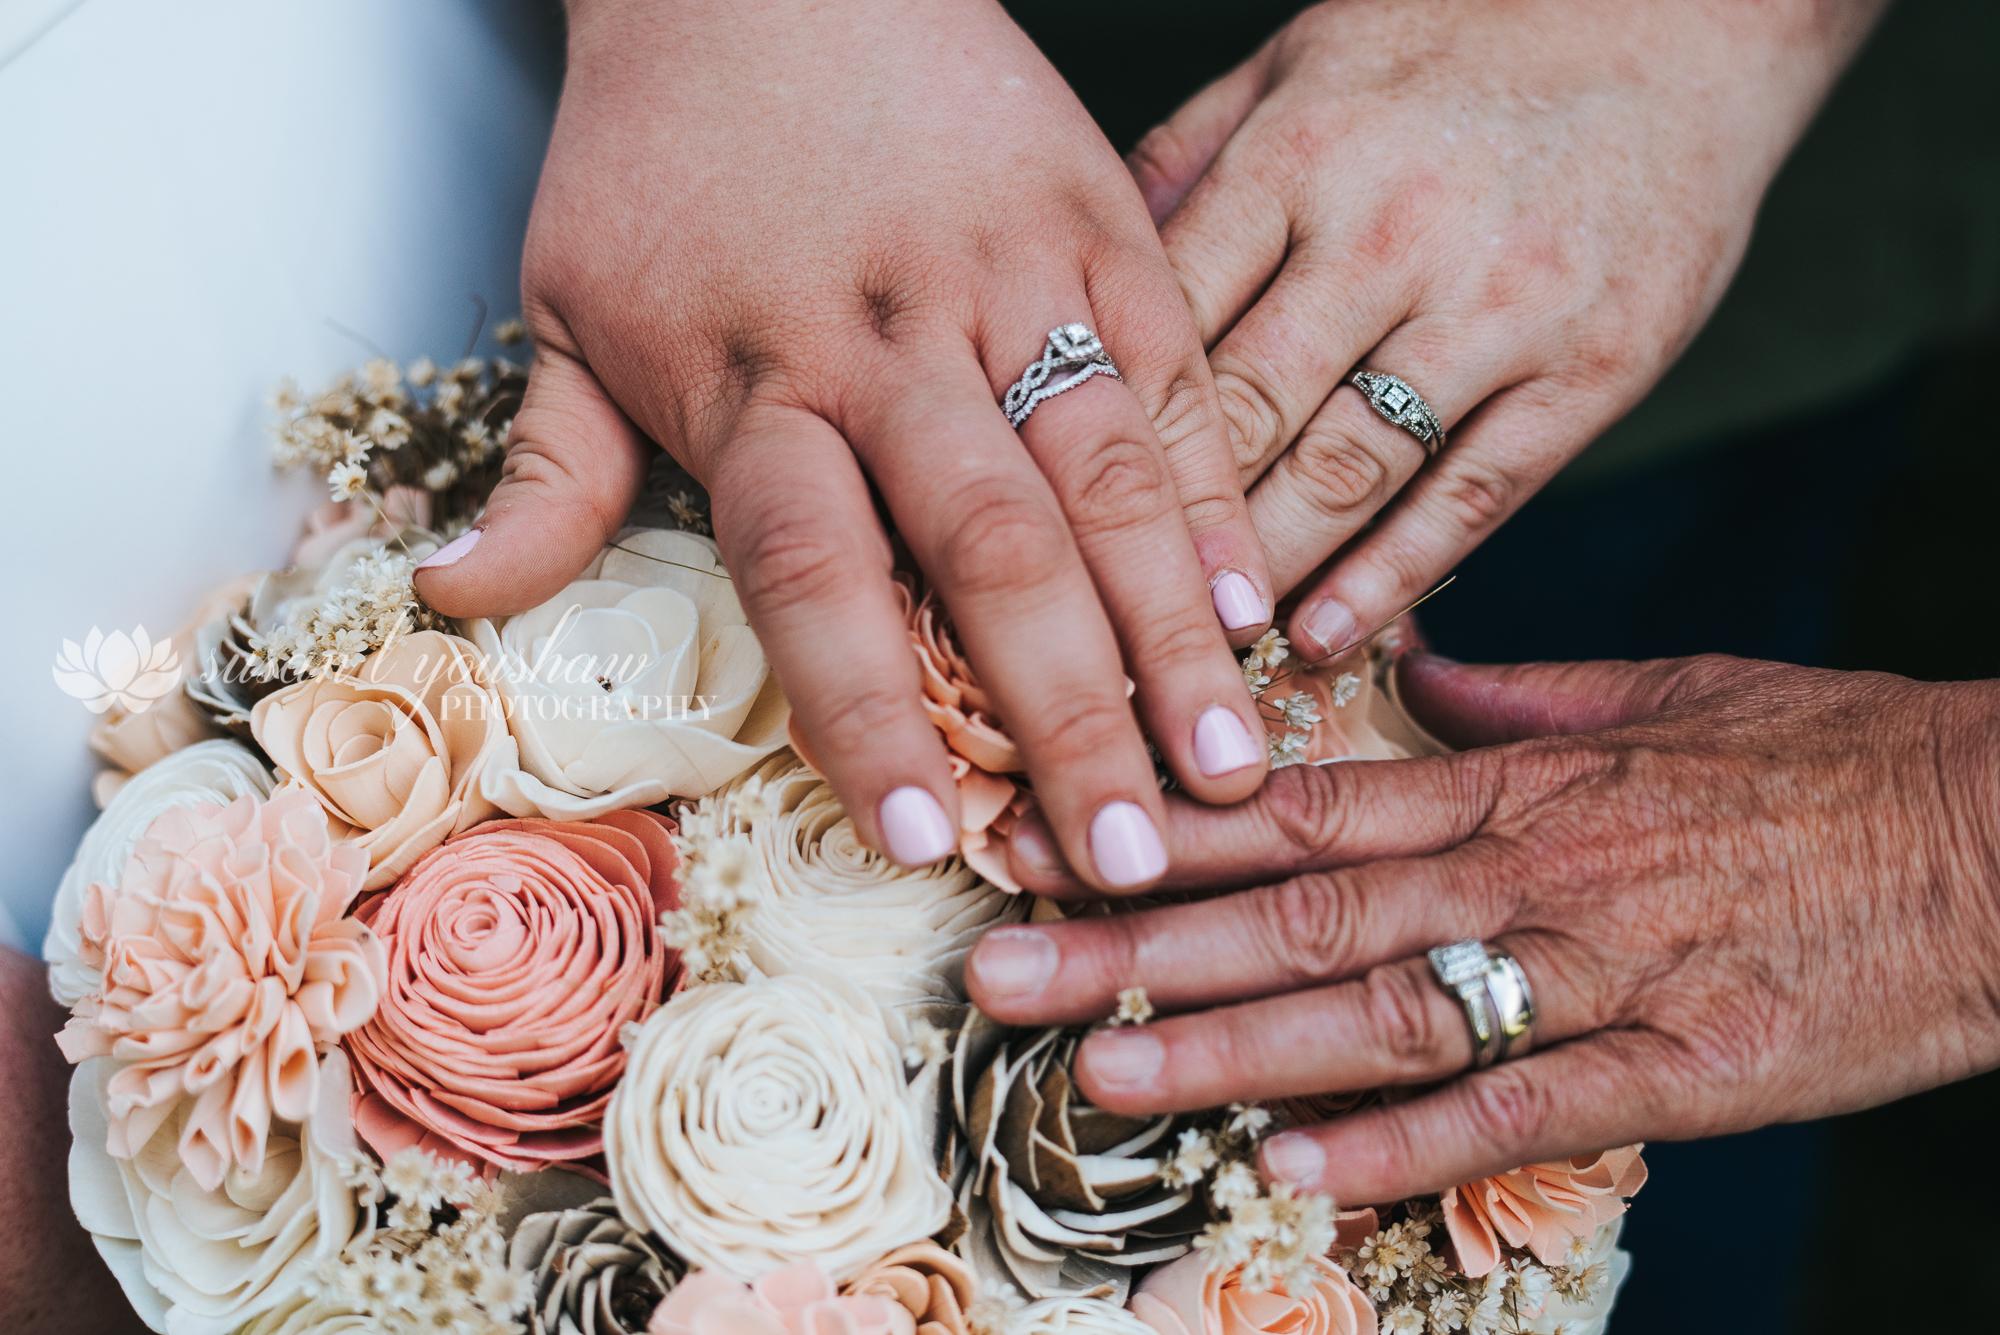 Bill and Sarah Wedding Photos 06-08-2019 SLY Photography -70.jpg